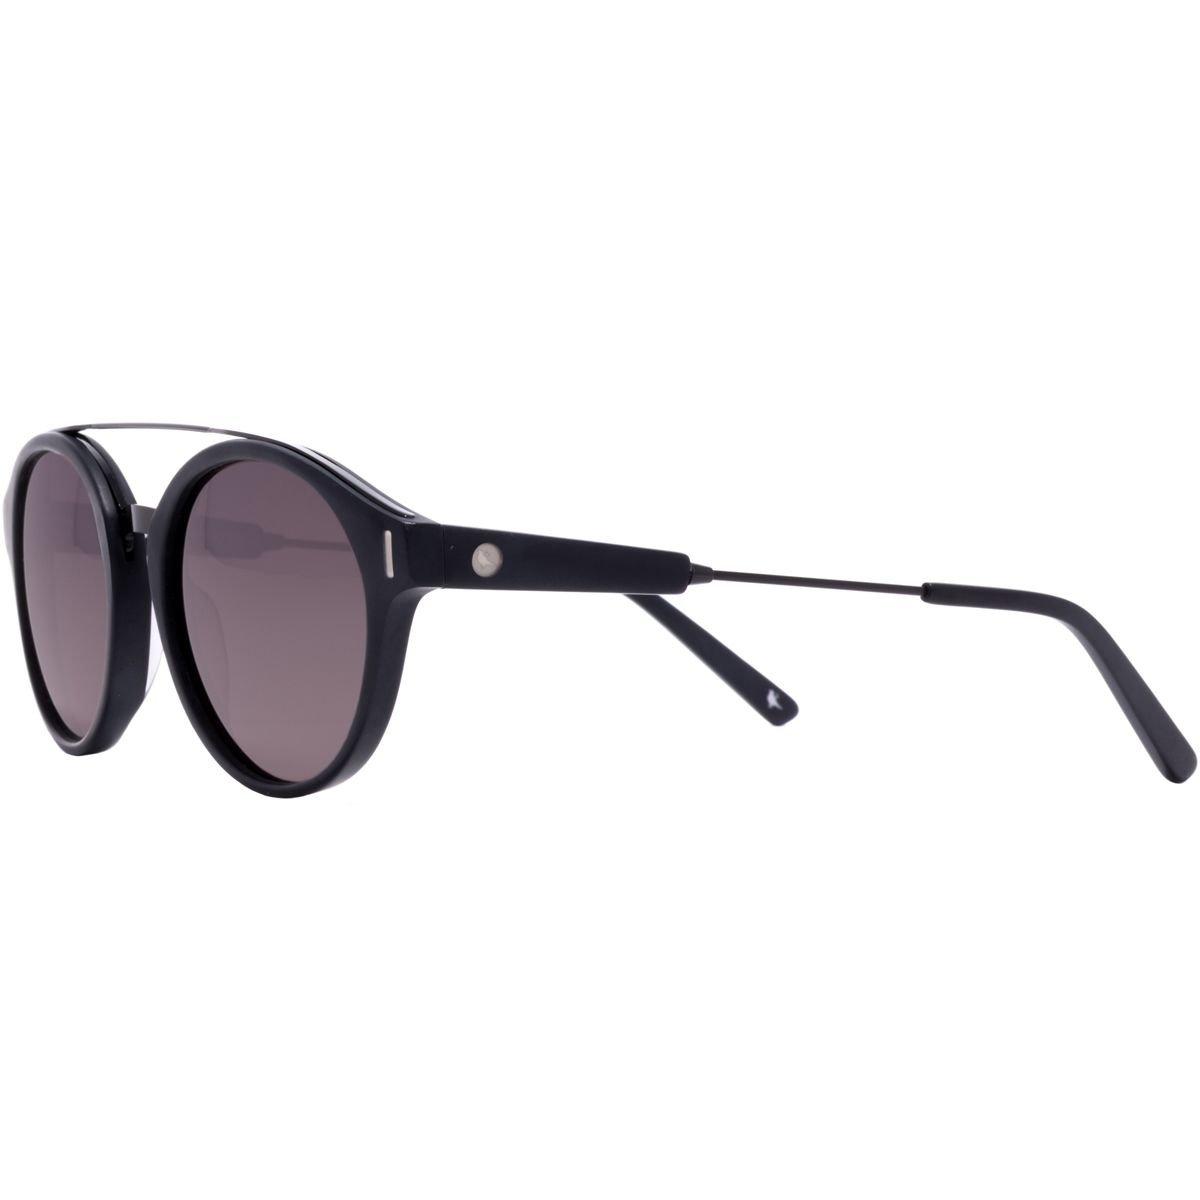 Clothing & Accessories Sunglasses & Eyewear Proof Eyewear Wilder Polarized Sunglasses